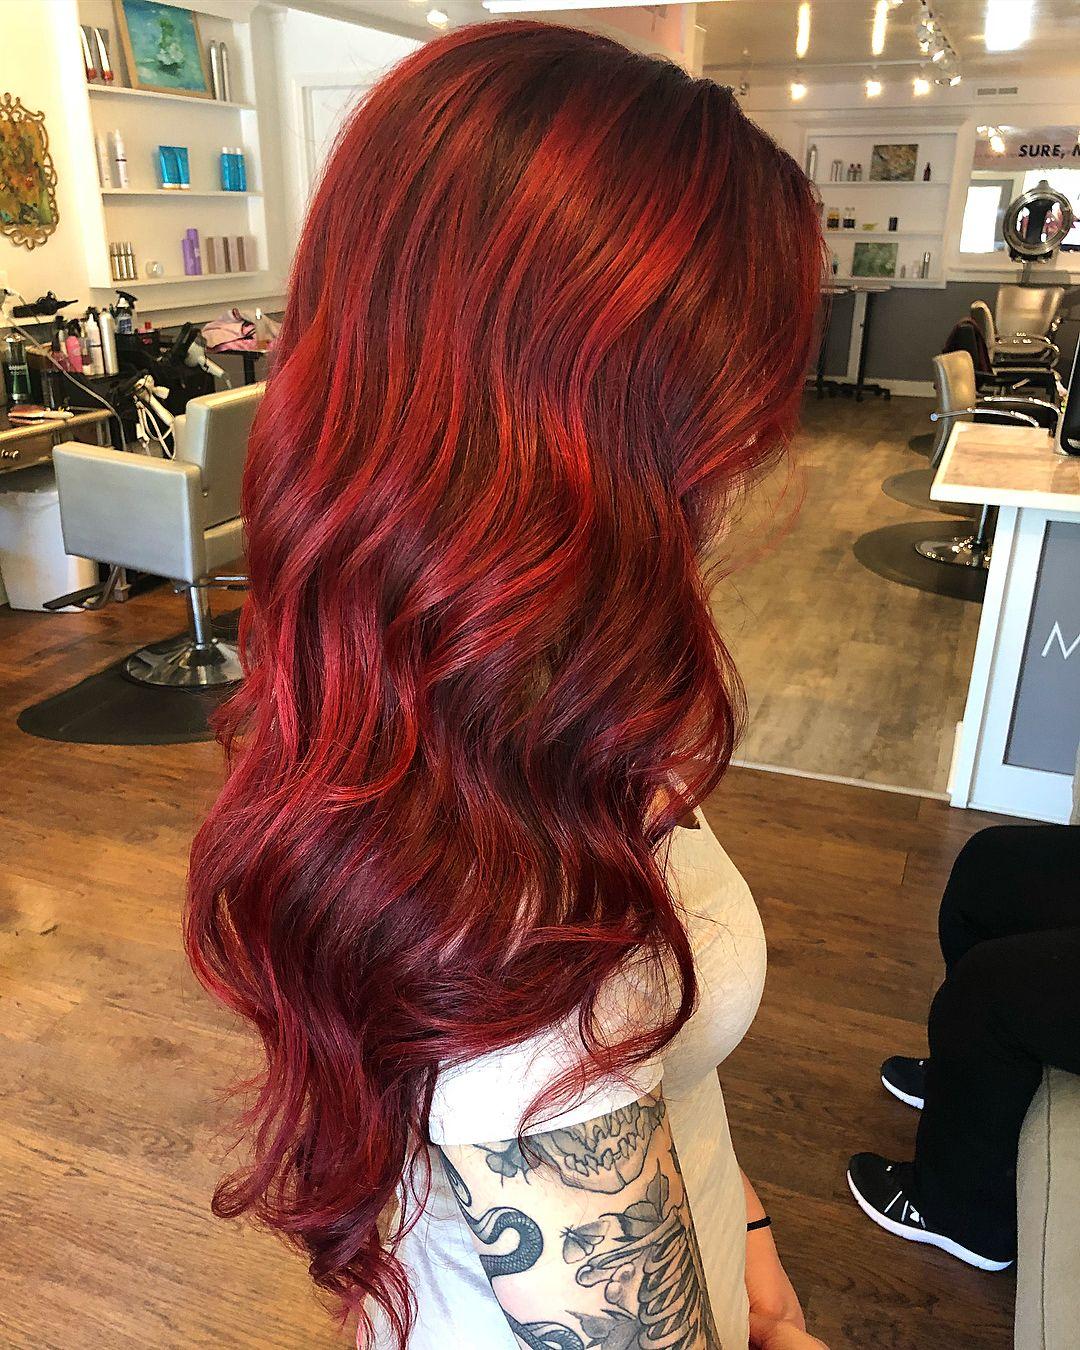 Wrath In 2020 Red Hair Inspo Fox Hair Dye Red Blonde Hair